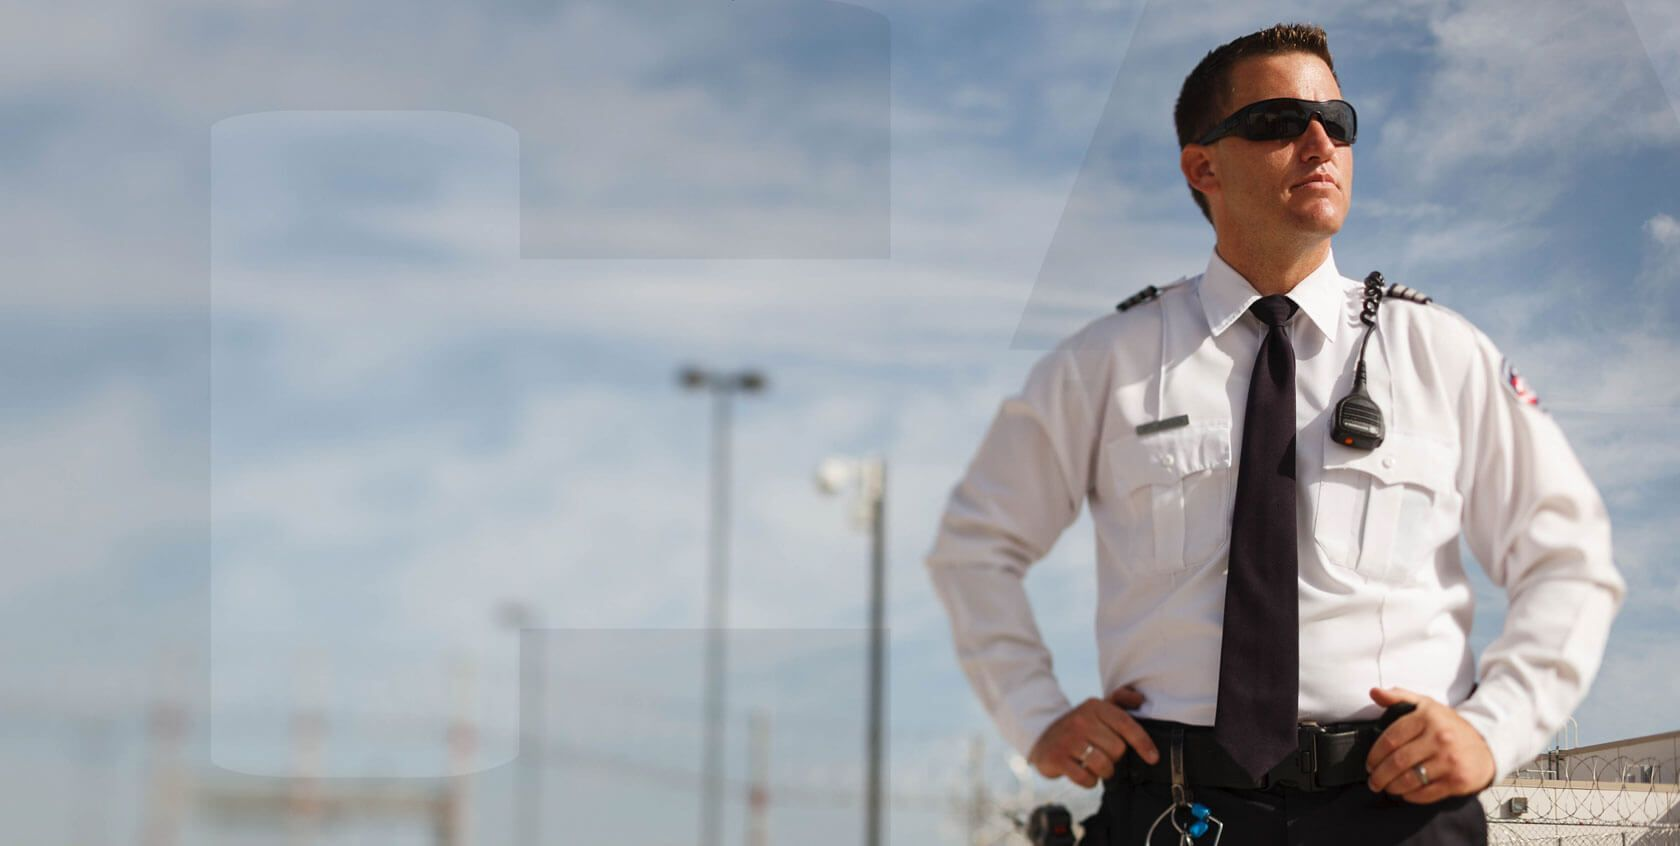 Jobs At Cca Job Job Opening Correctional Officer